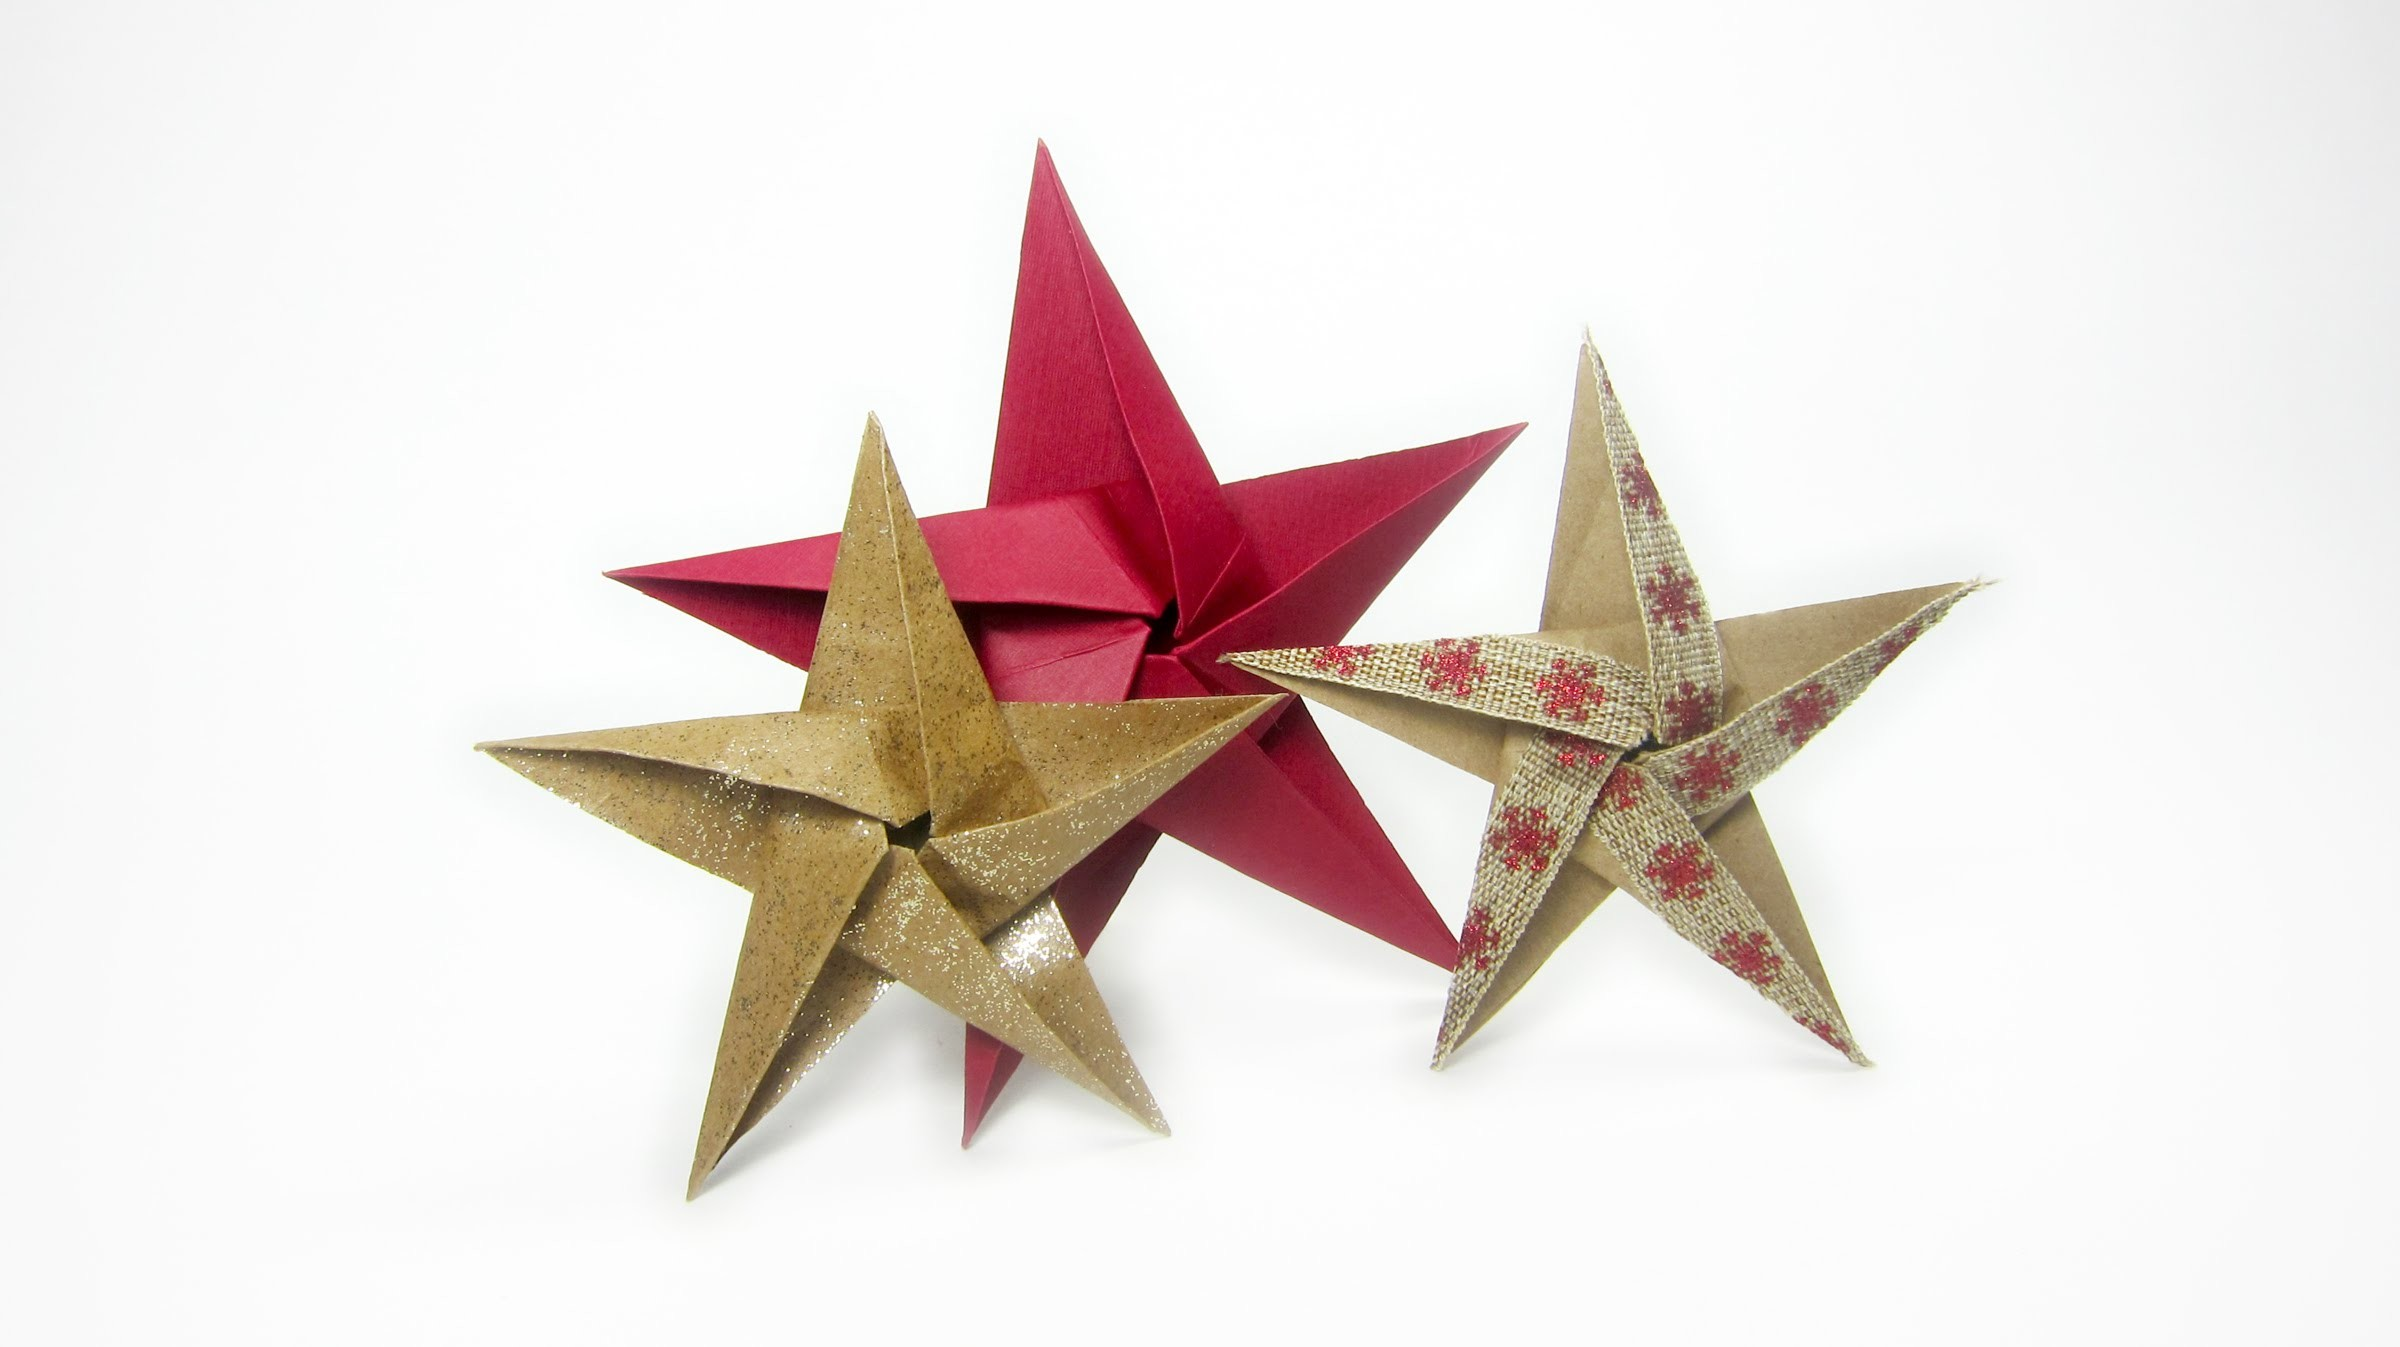 5 Pointed Origami Star Folding - DIY